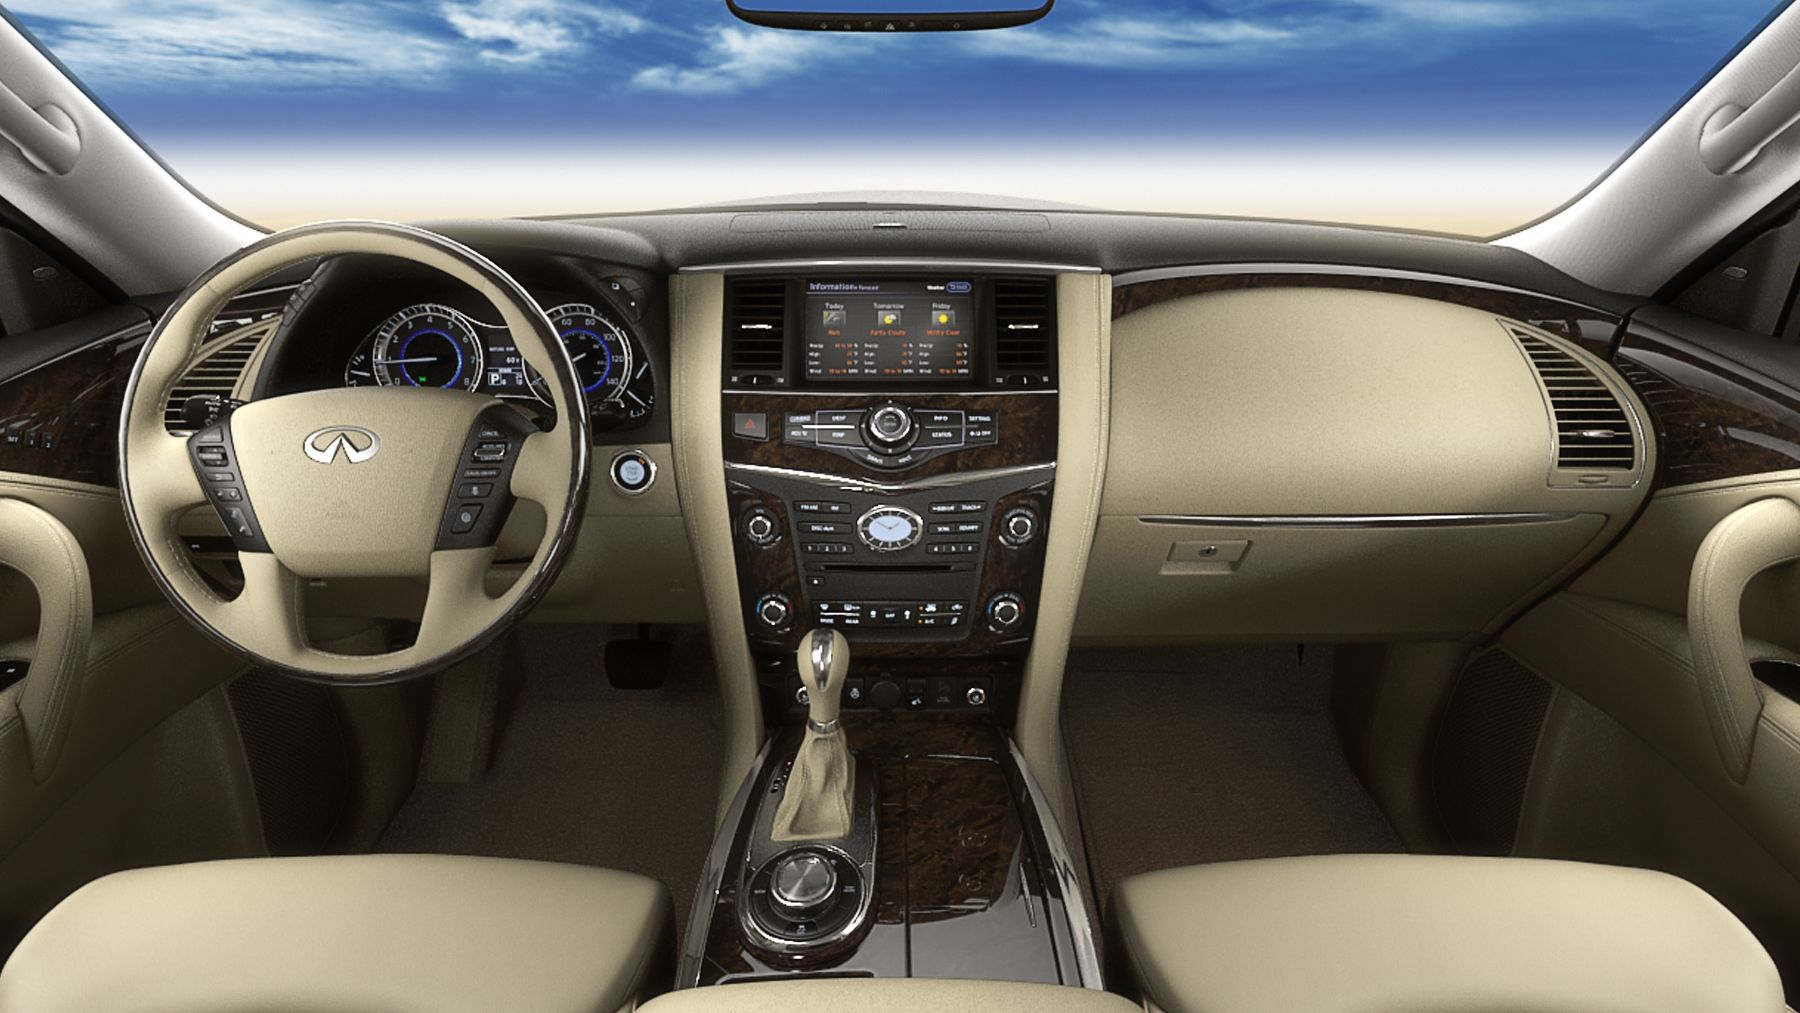 2014 infiniti qx80 suv car beige dashboard interior 2014 2014 infiniti qx80 suv car beige dashboard interior vanachro Images